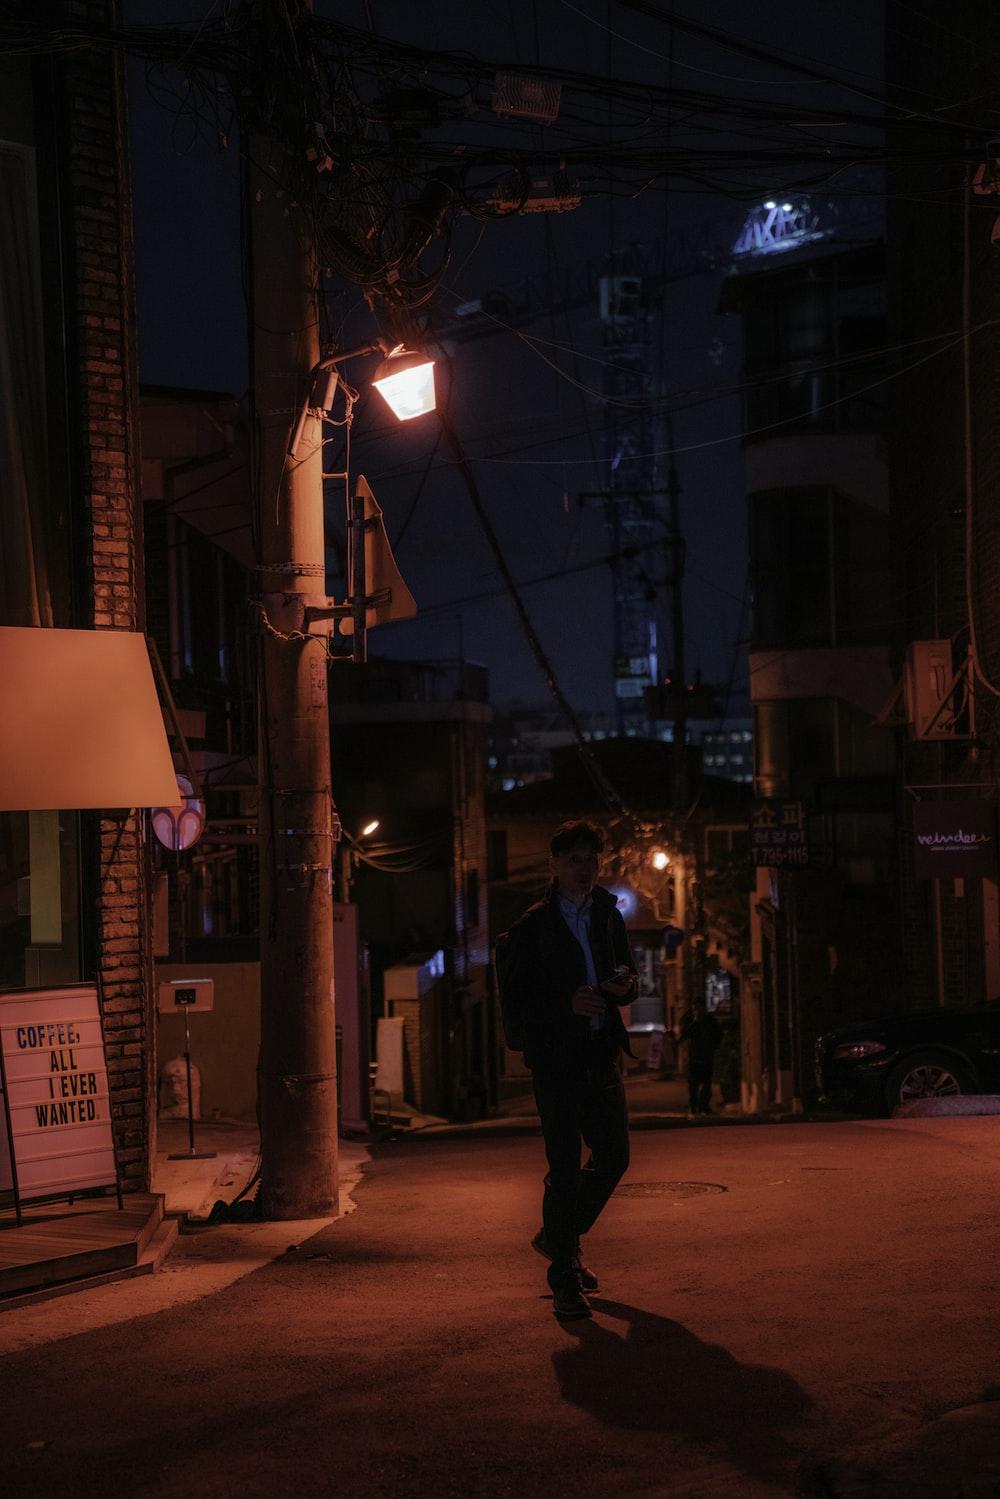 man in black jacket and pants walking on street during night time